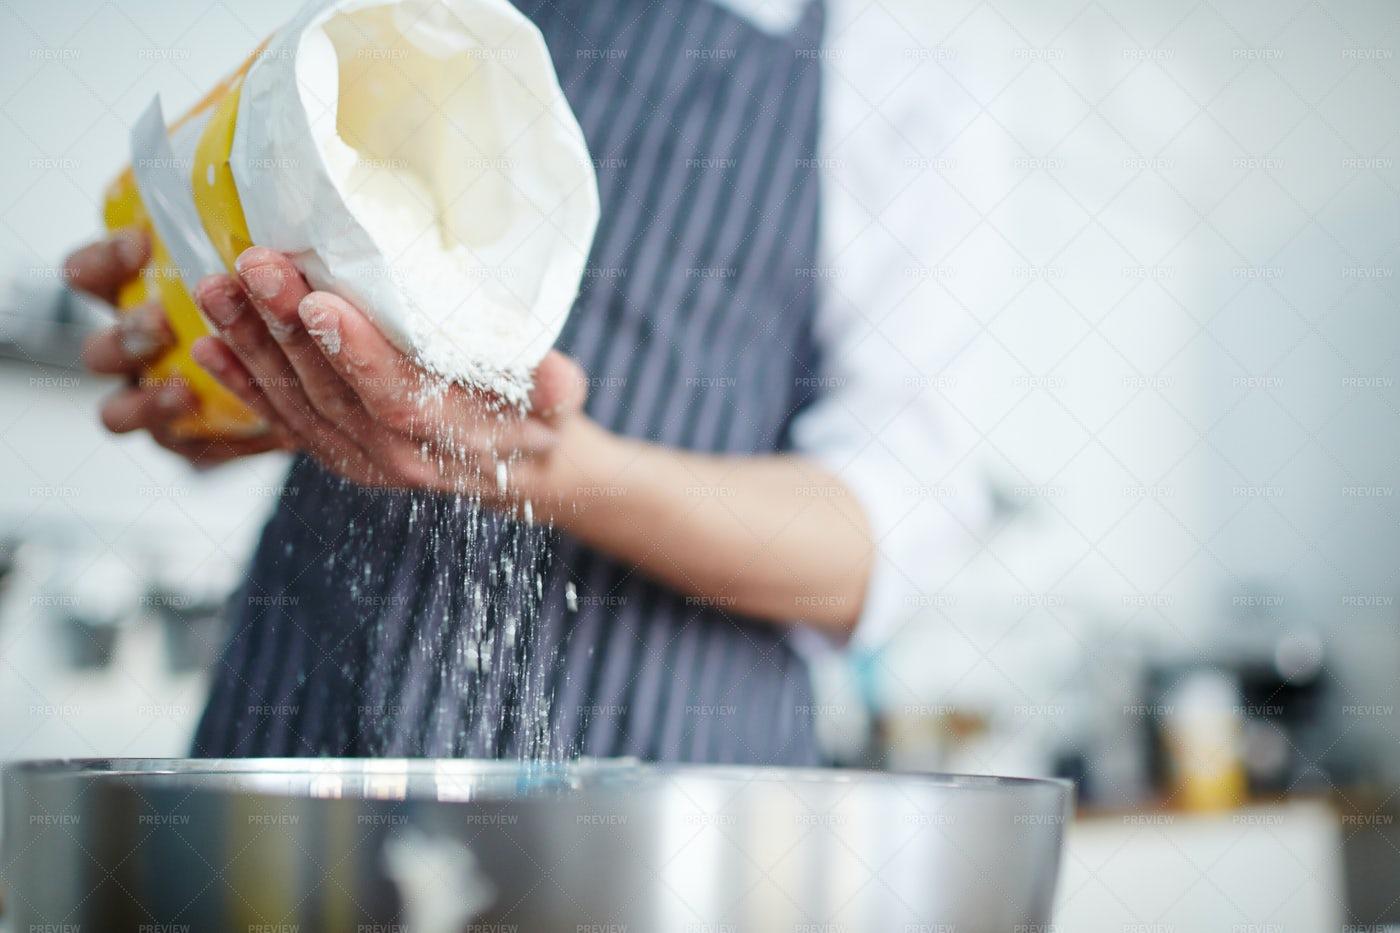 Making Dough: Stock Photos